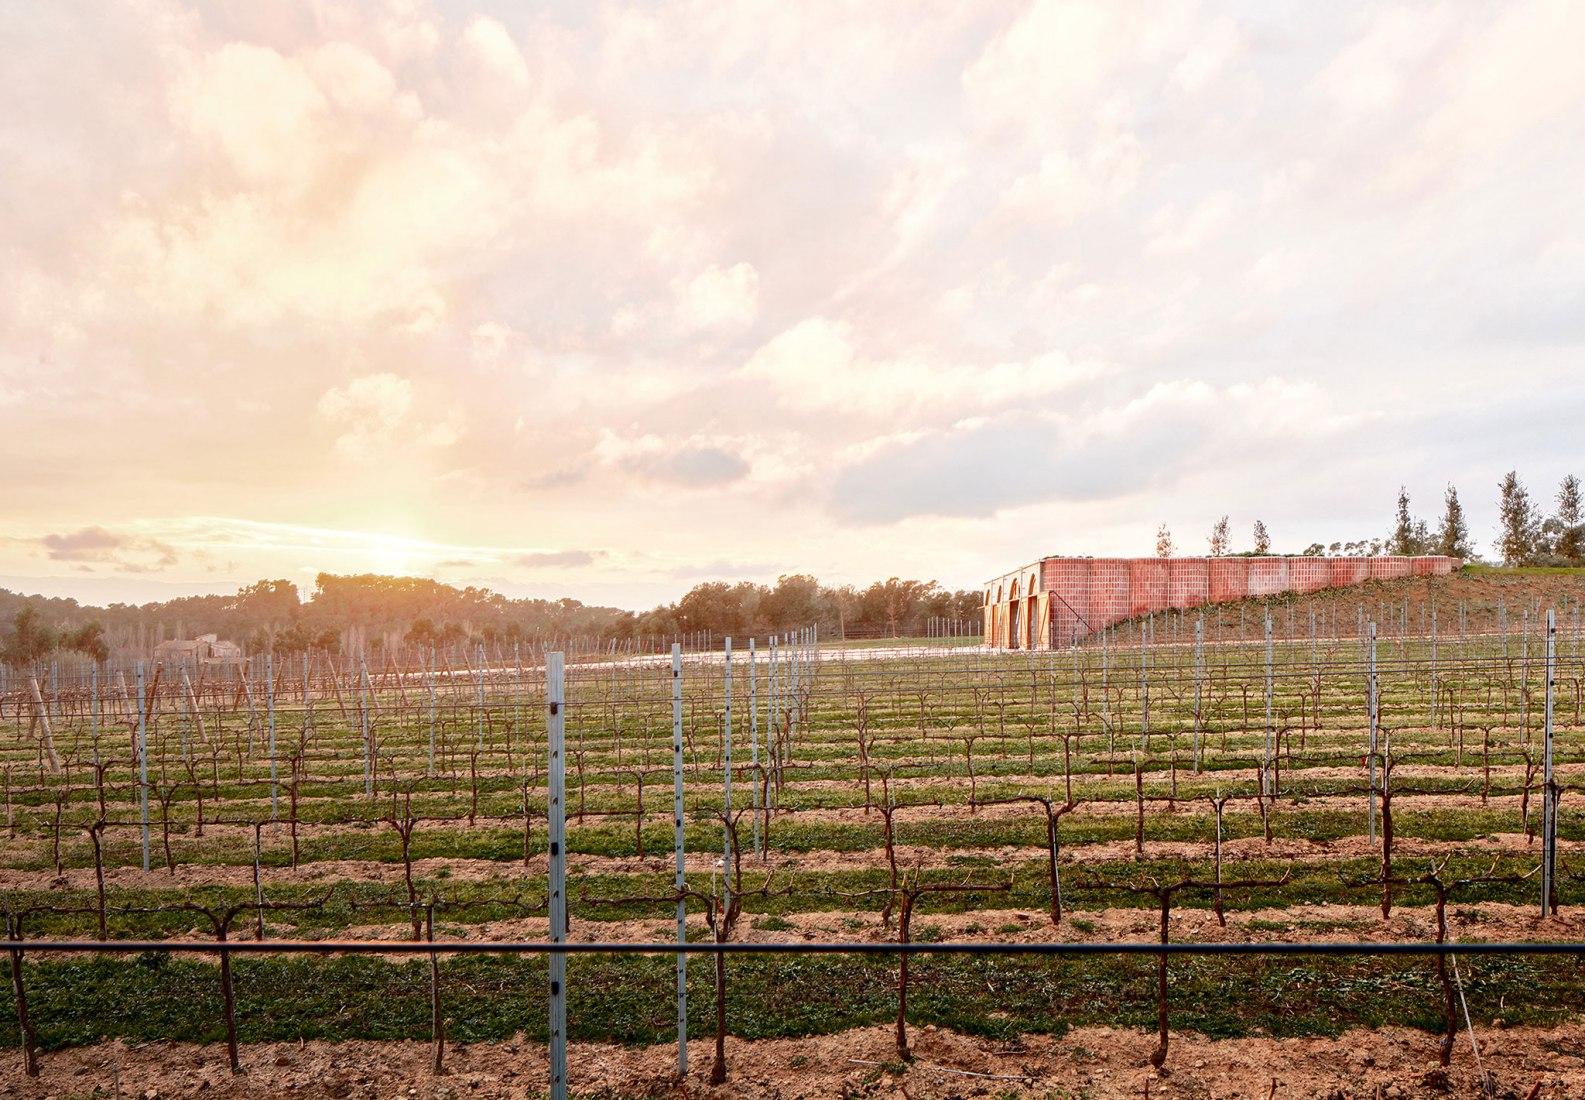 Mont-Ras Winery by Jorge Vidal and Víctor Rahola. Photograph © José Hevia